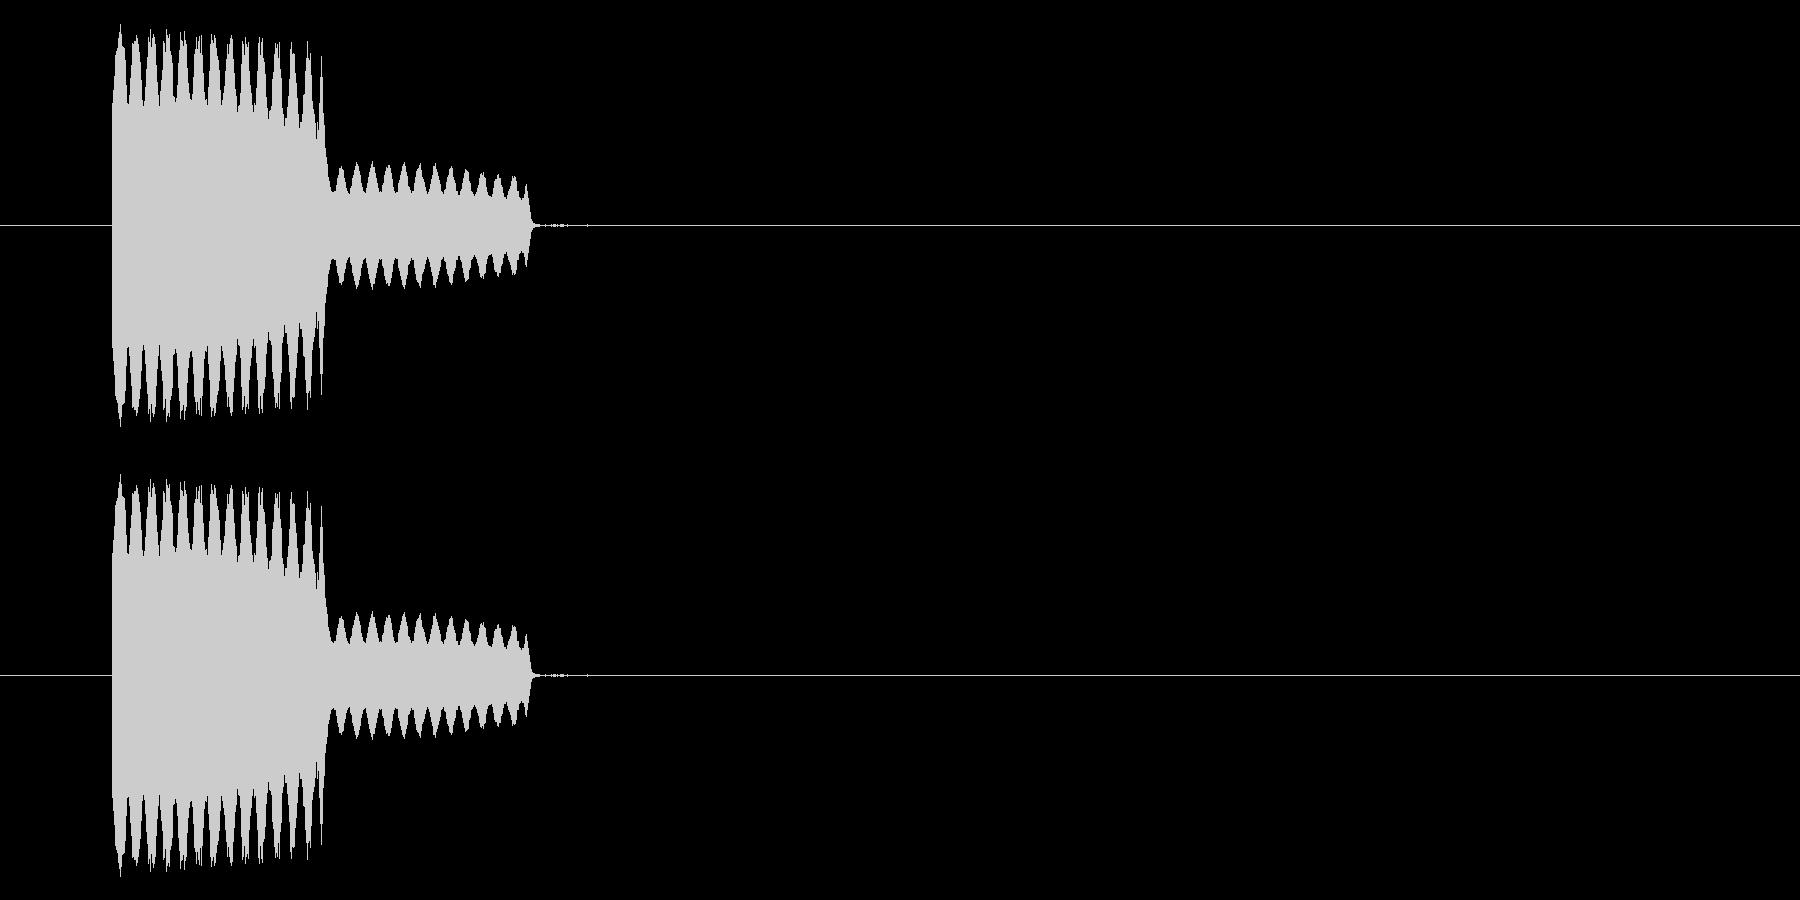 【GB 汎用02-04(ピッチ)】 の未再生の波形